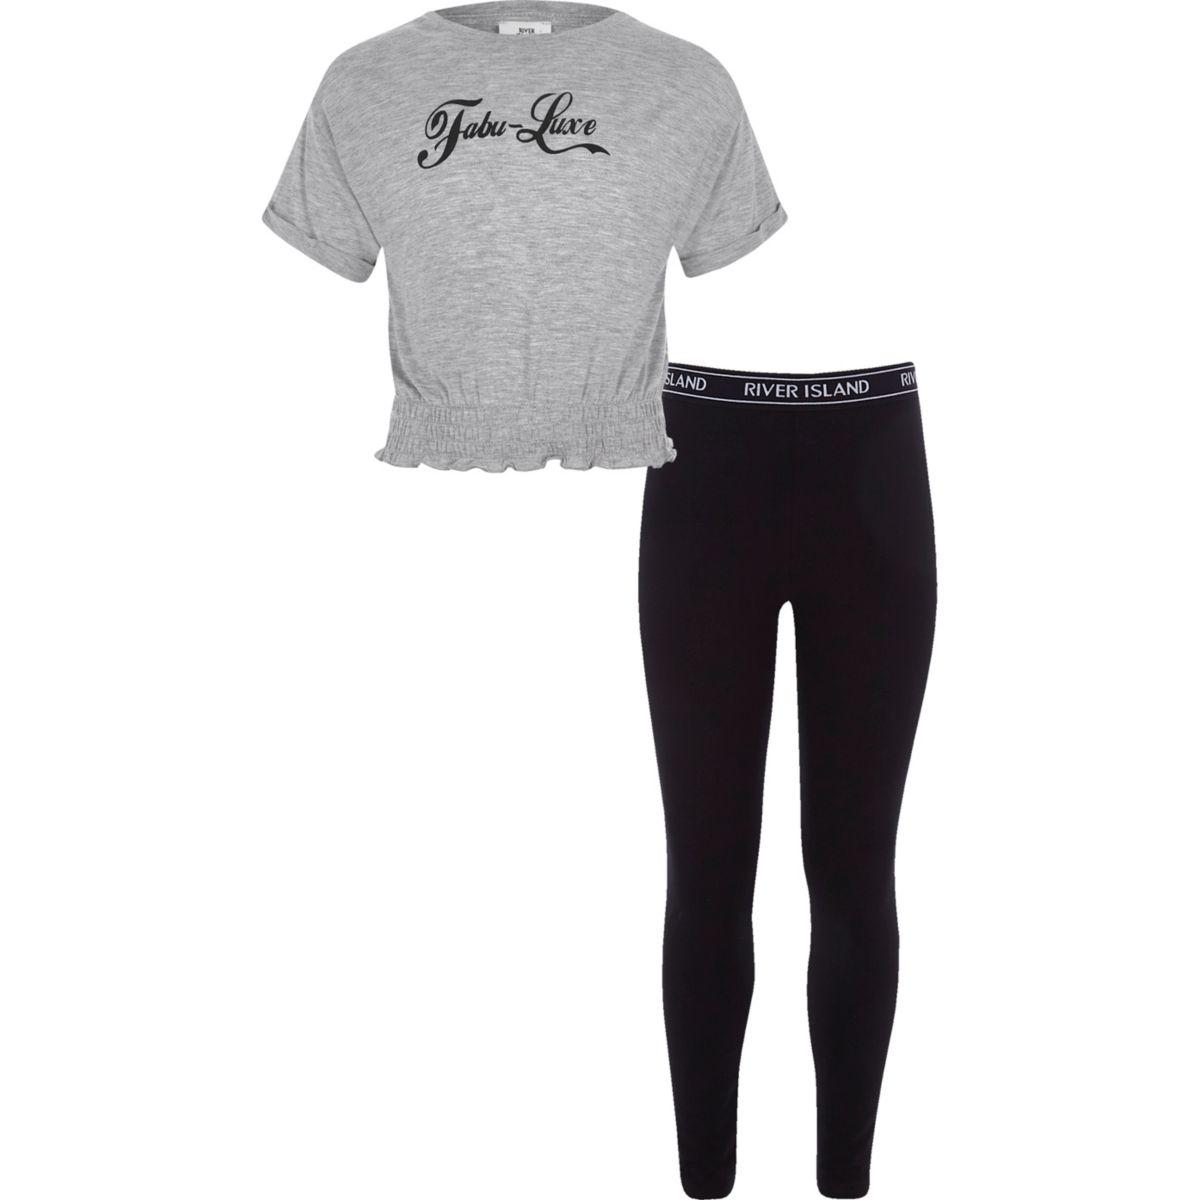 Outfit mit grauem T-Shirt und Leggings